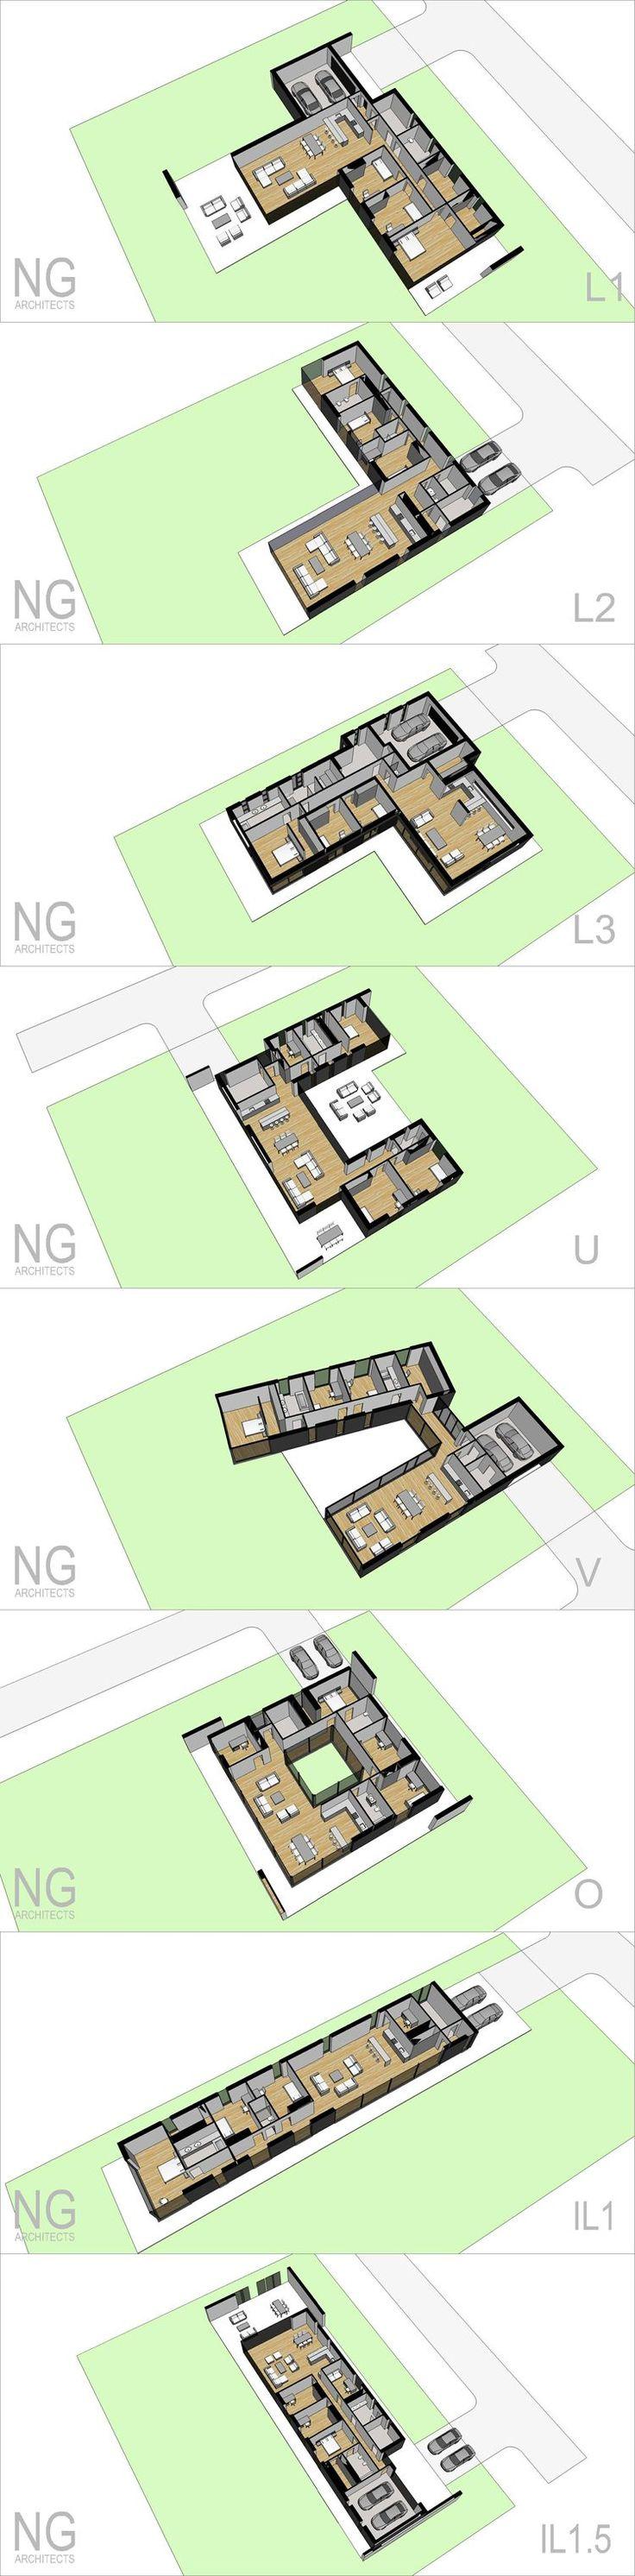 Muro de tijolo a vista fotos e modelos casa constru 237 da - 5c79e8243bbaf4795cacdcdd7e542f32 Jpg 750 3042